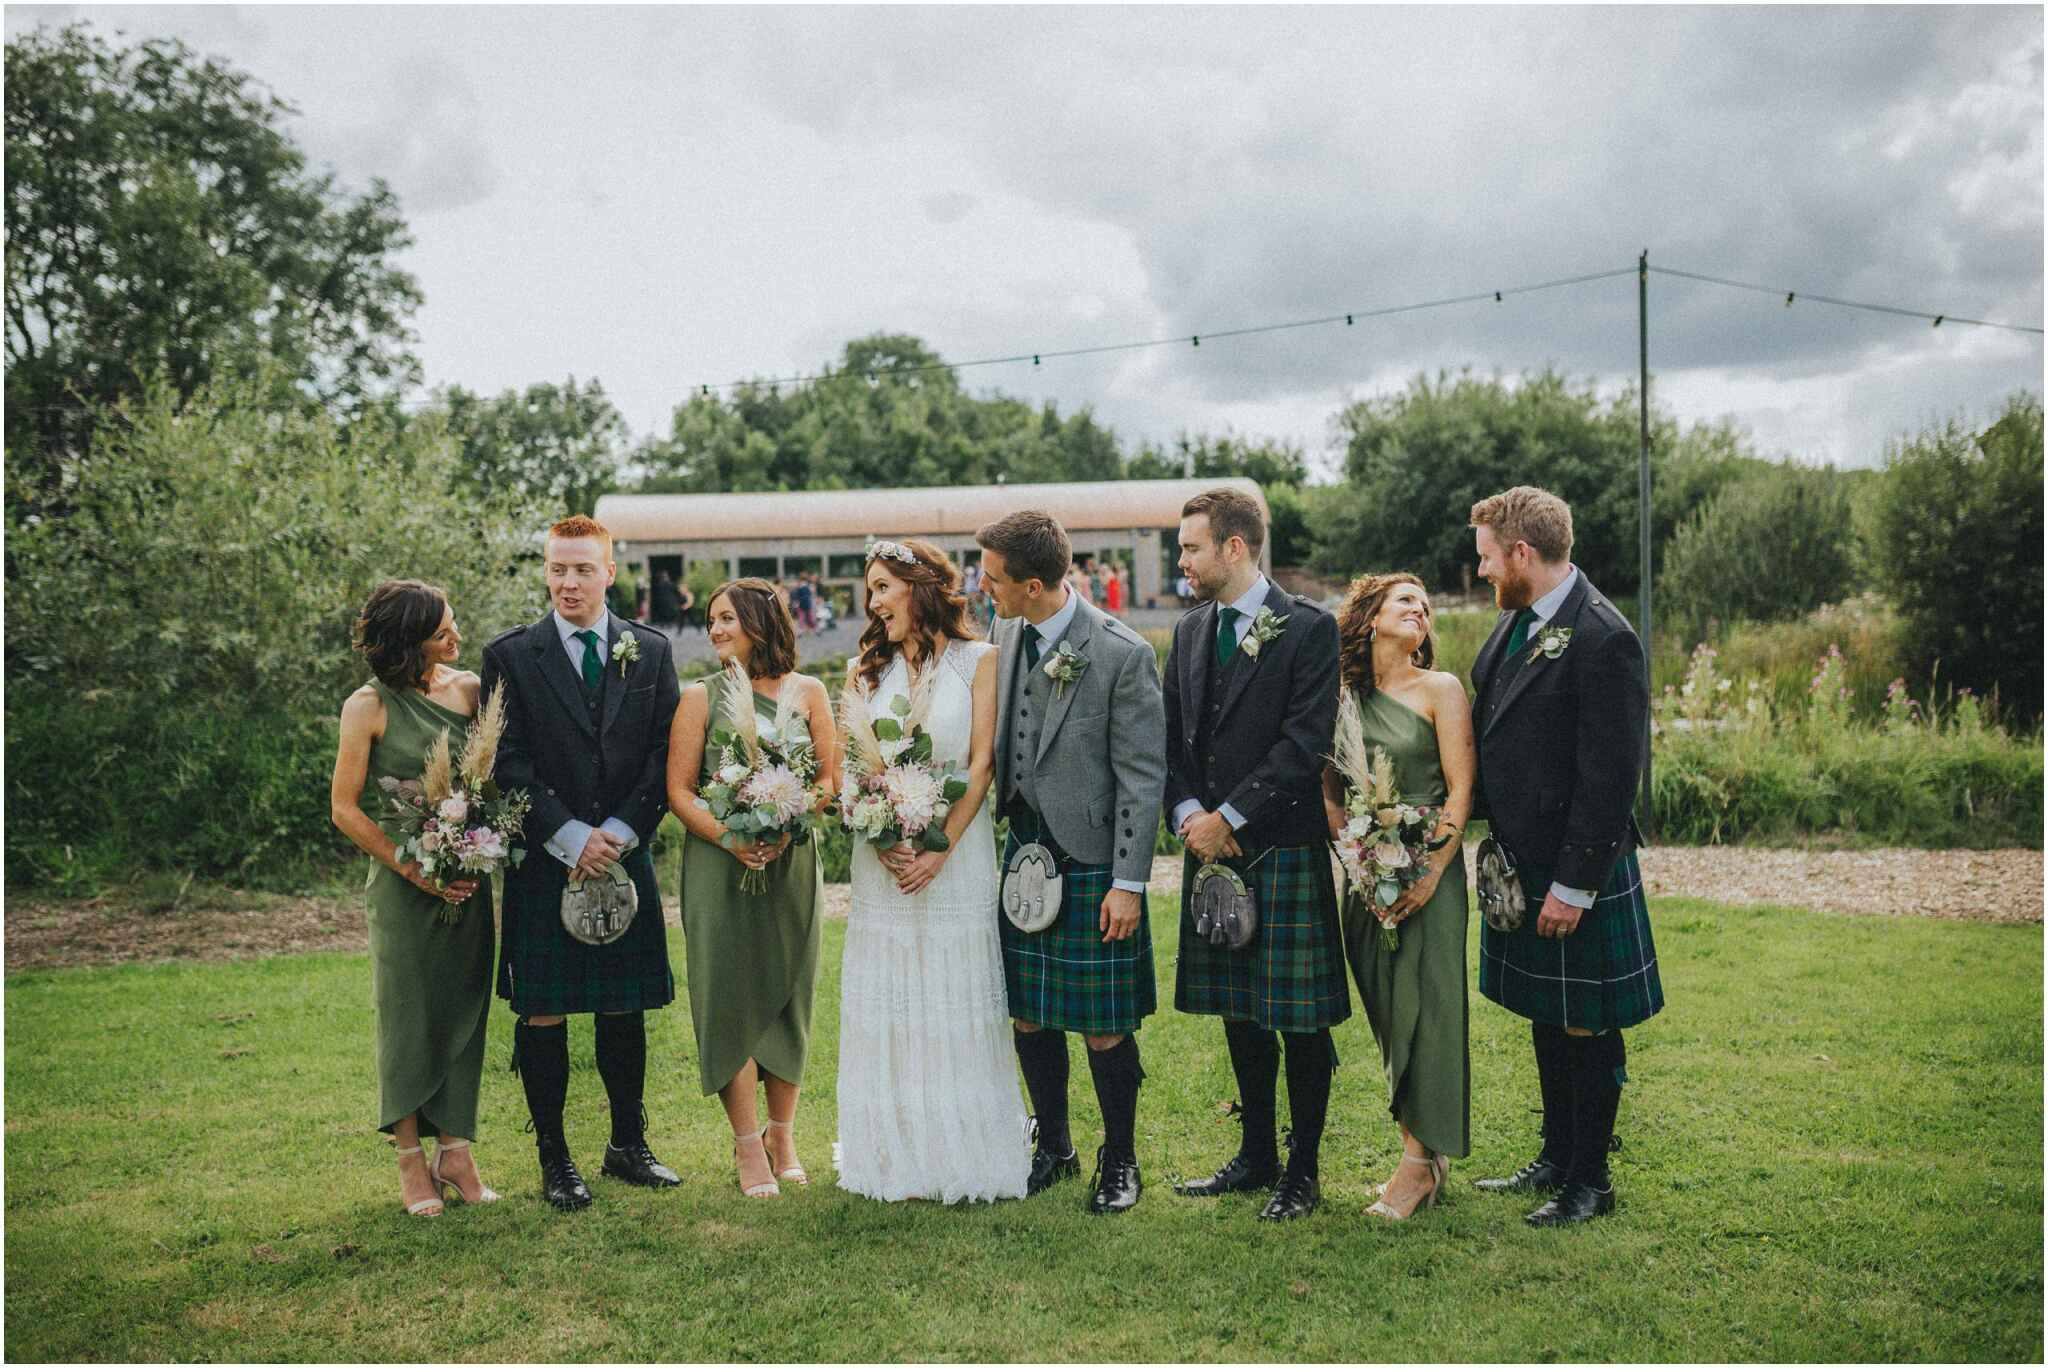 Fionnuala + Paul - Mount Druid Alternative Wedding 116